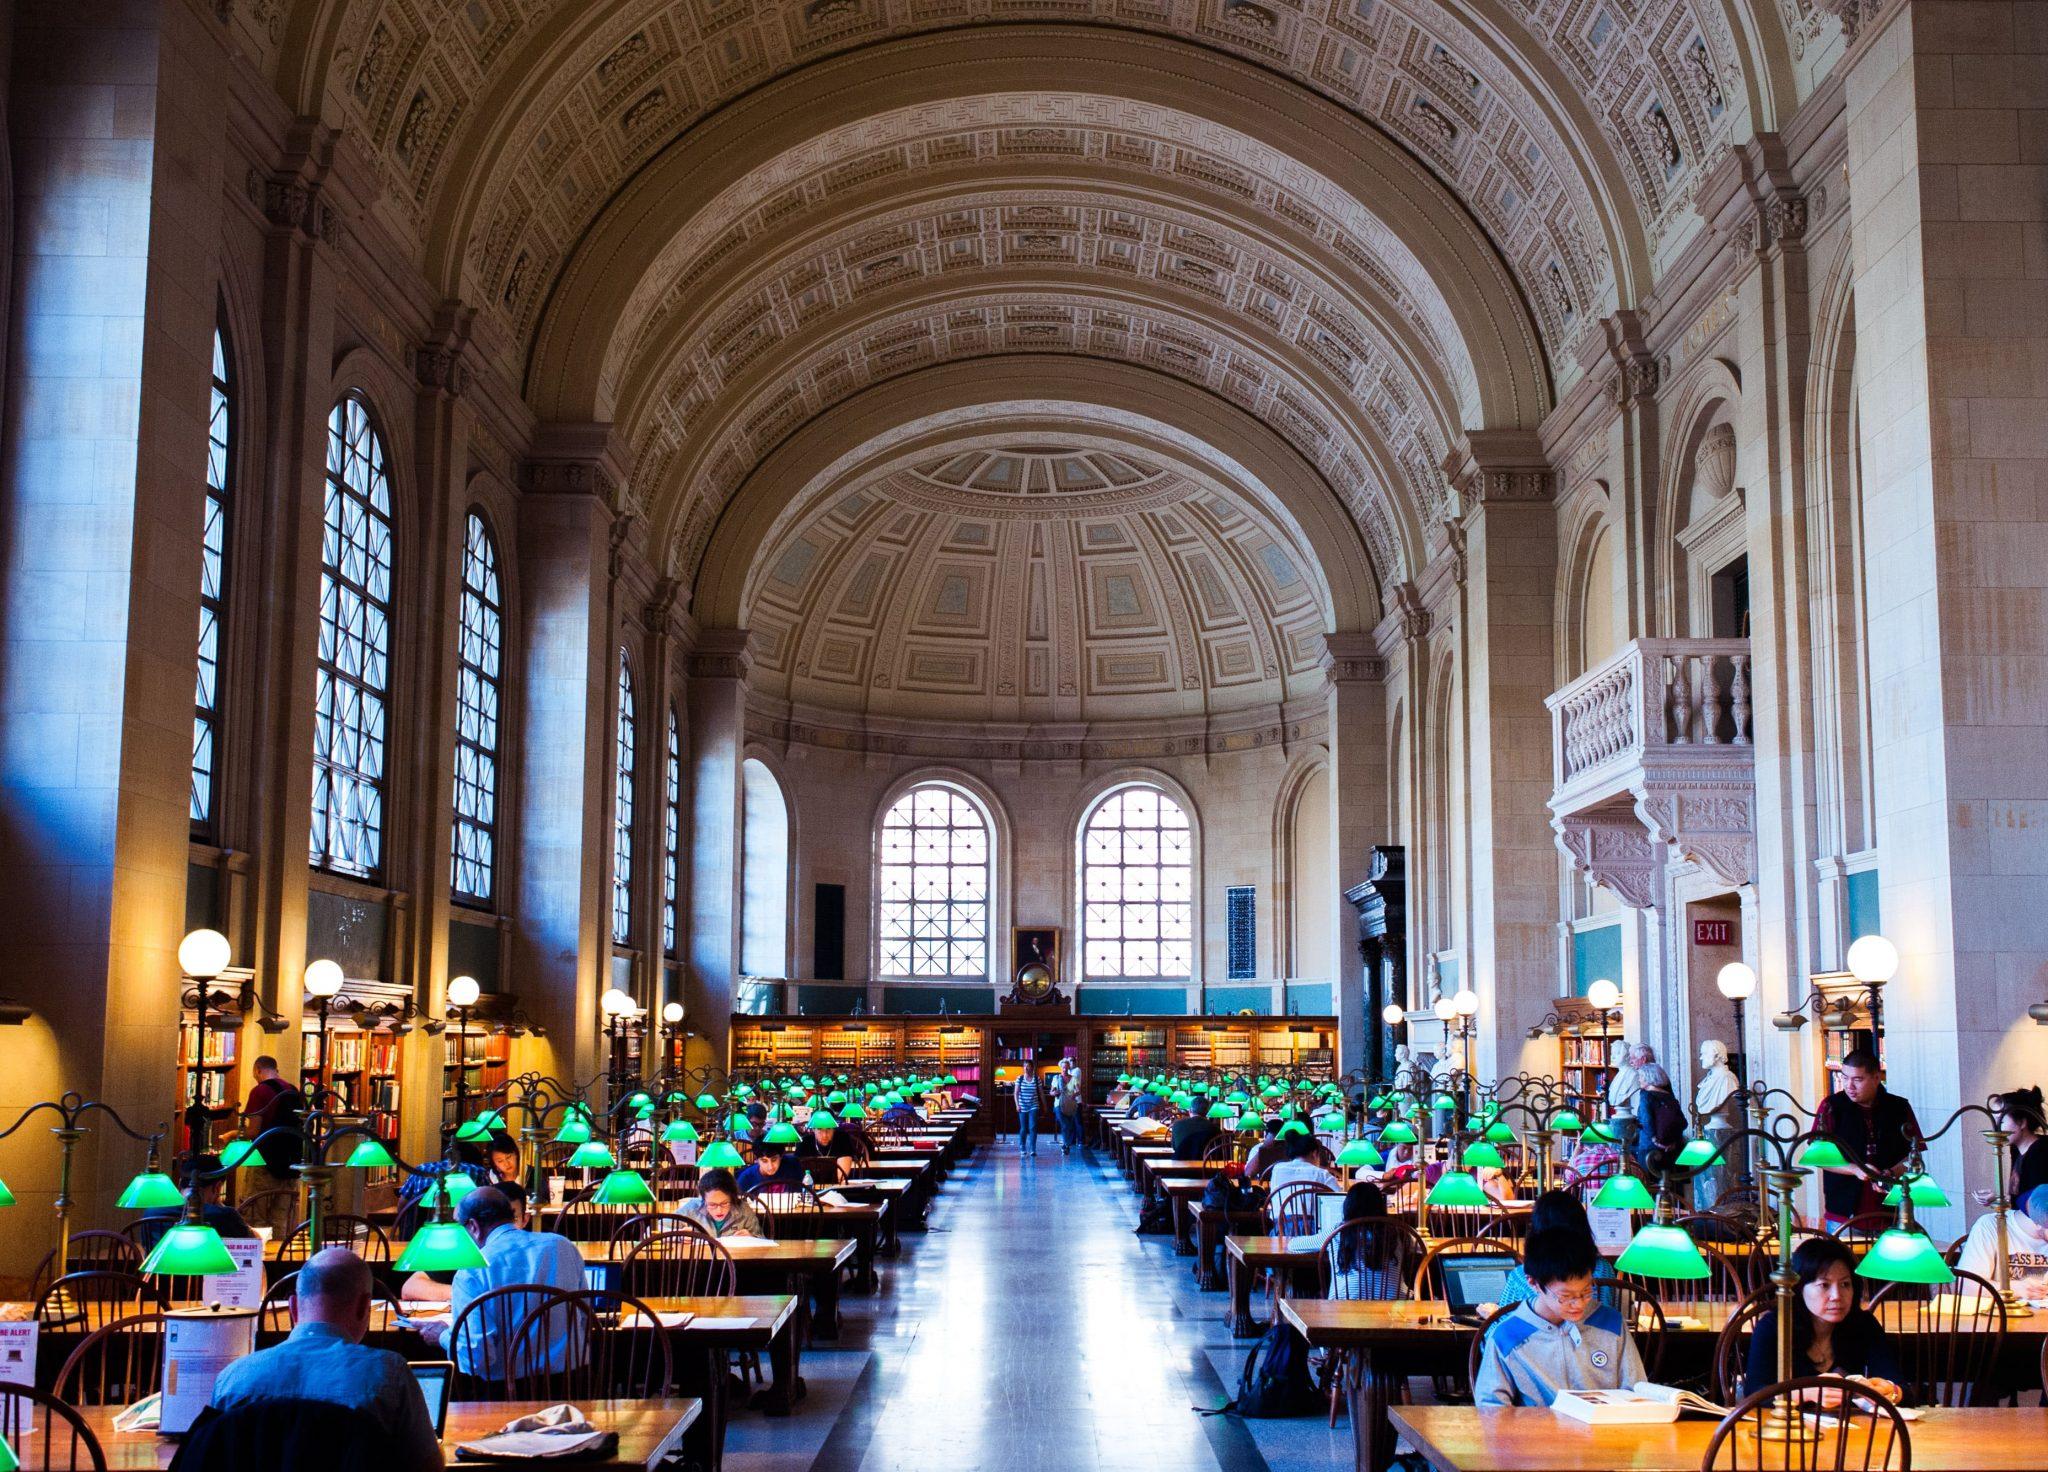 فیلیپ جانسون Boston Public Library